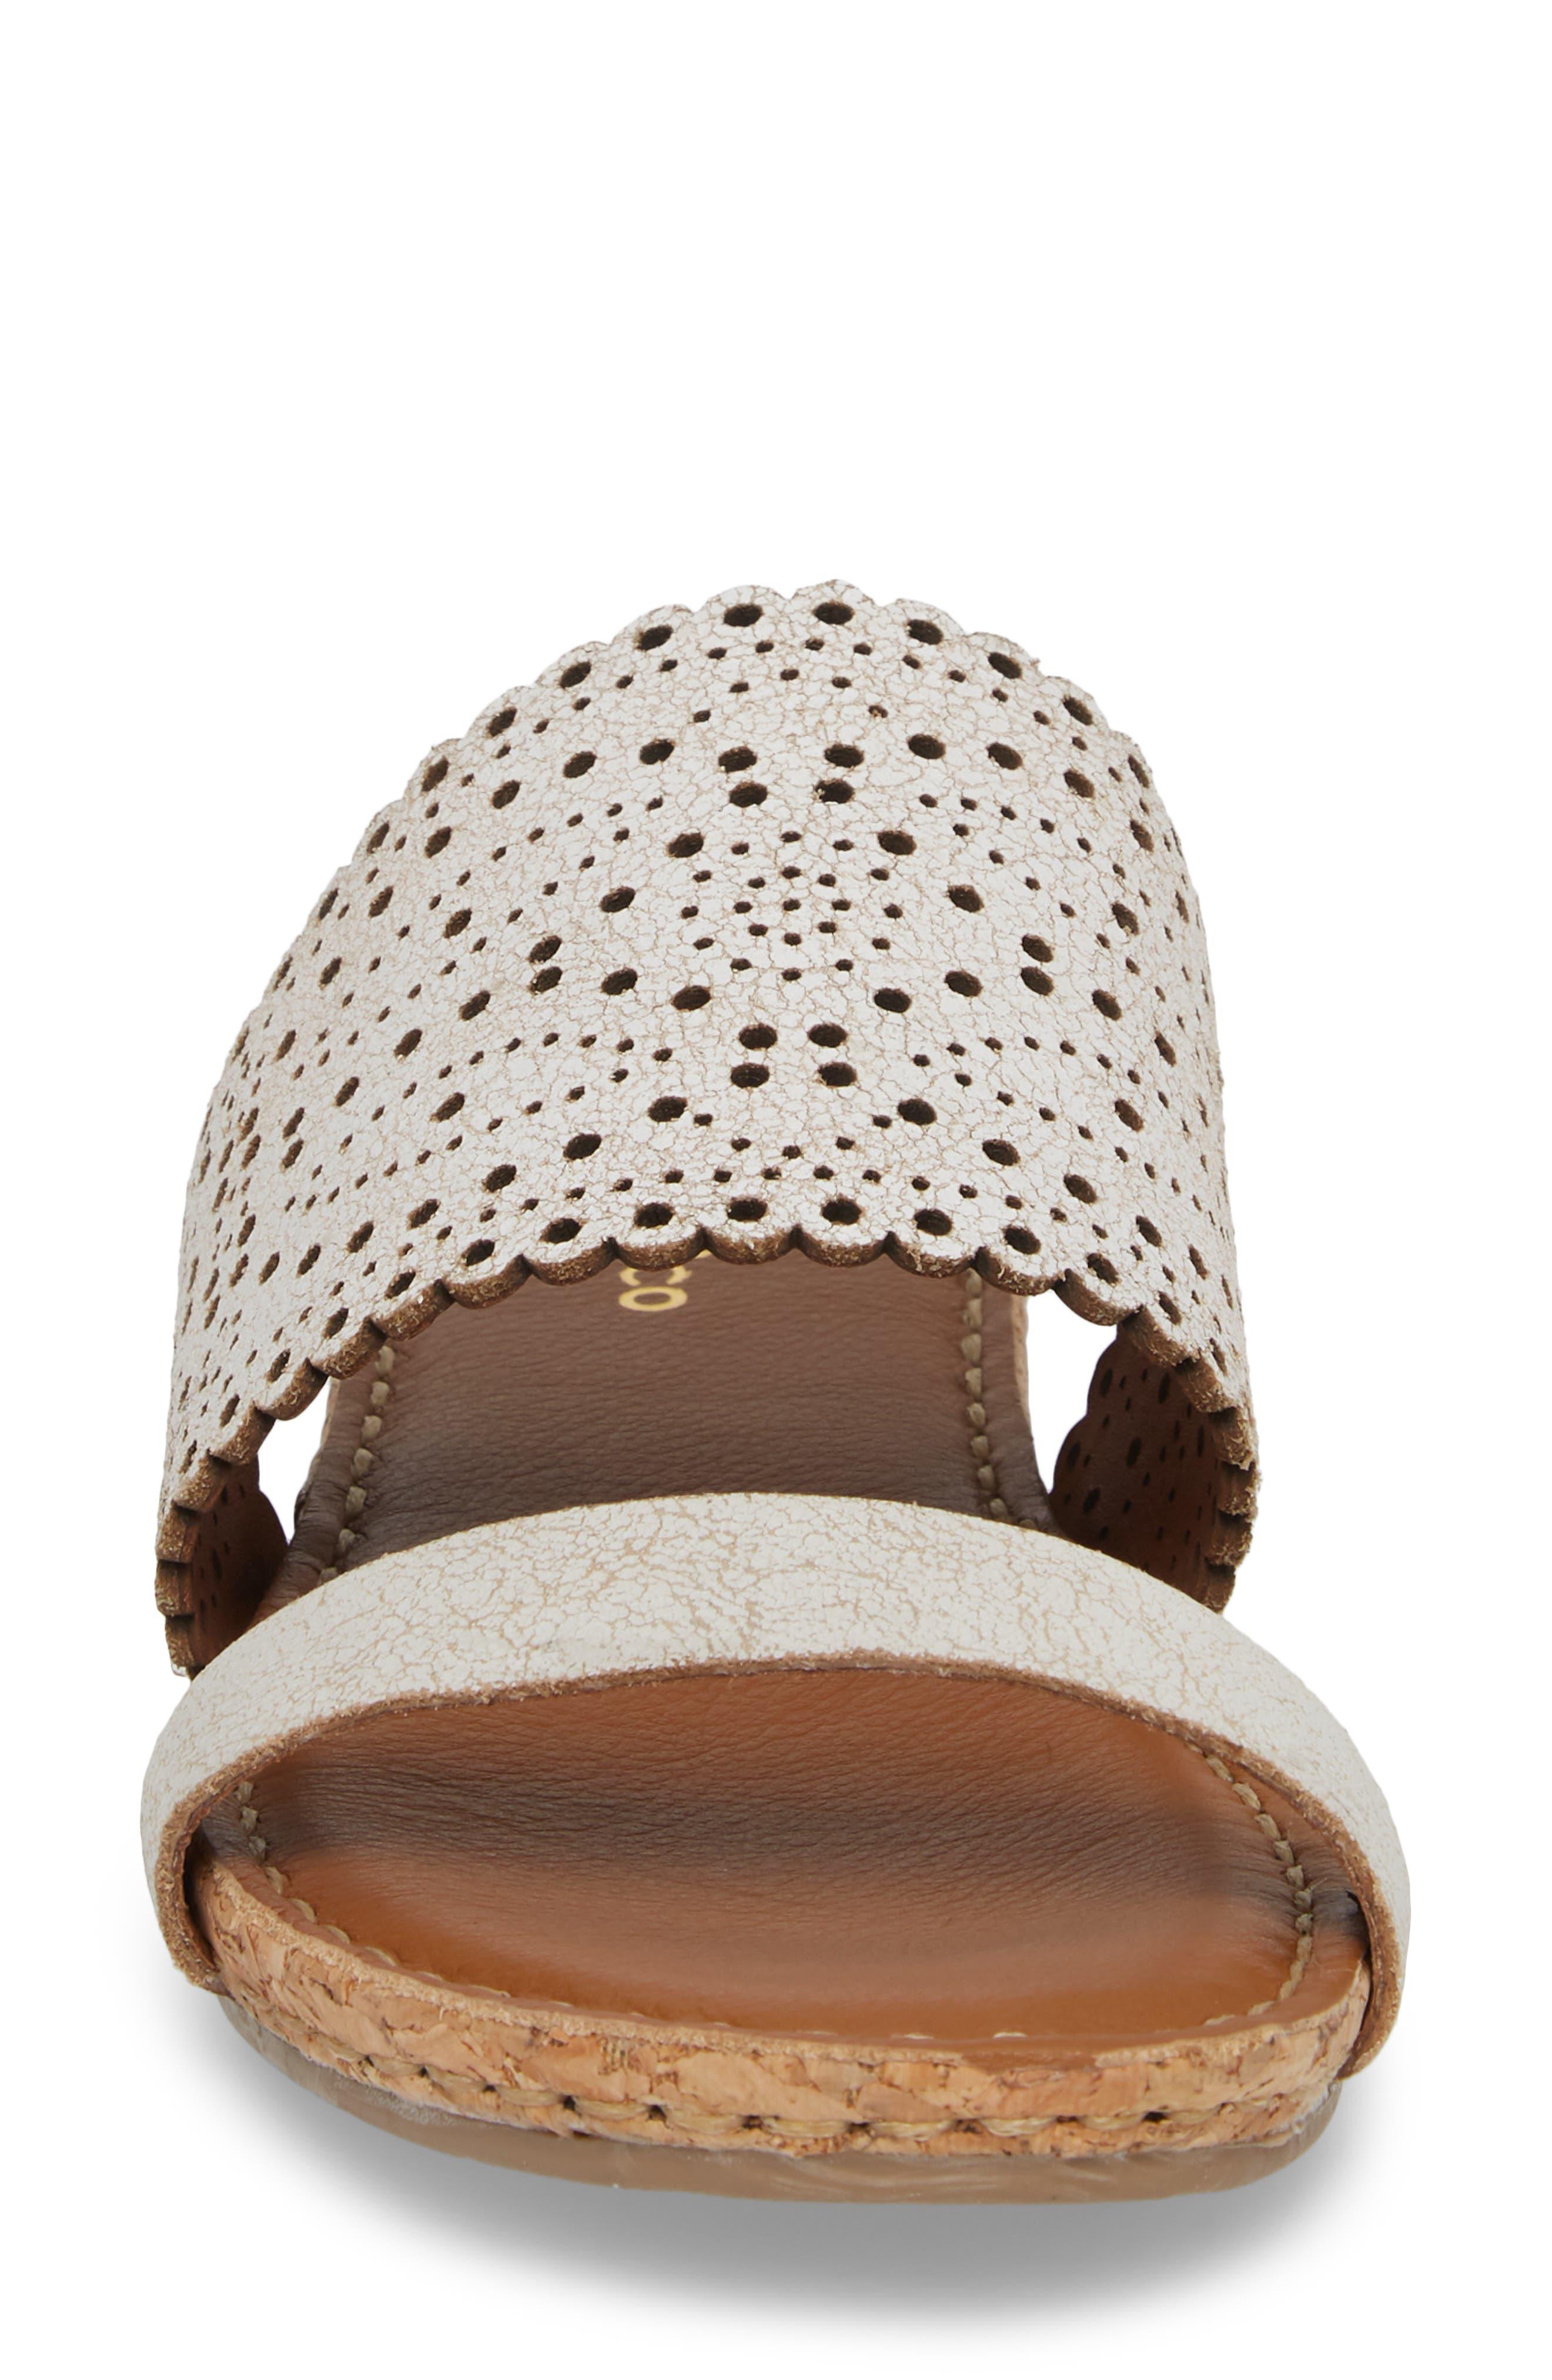 KLUB NICO, Ginette Perforated Slide Sandal, Alternate thumbnail 4, color, WHITE LEATHER